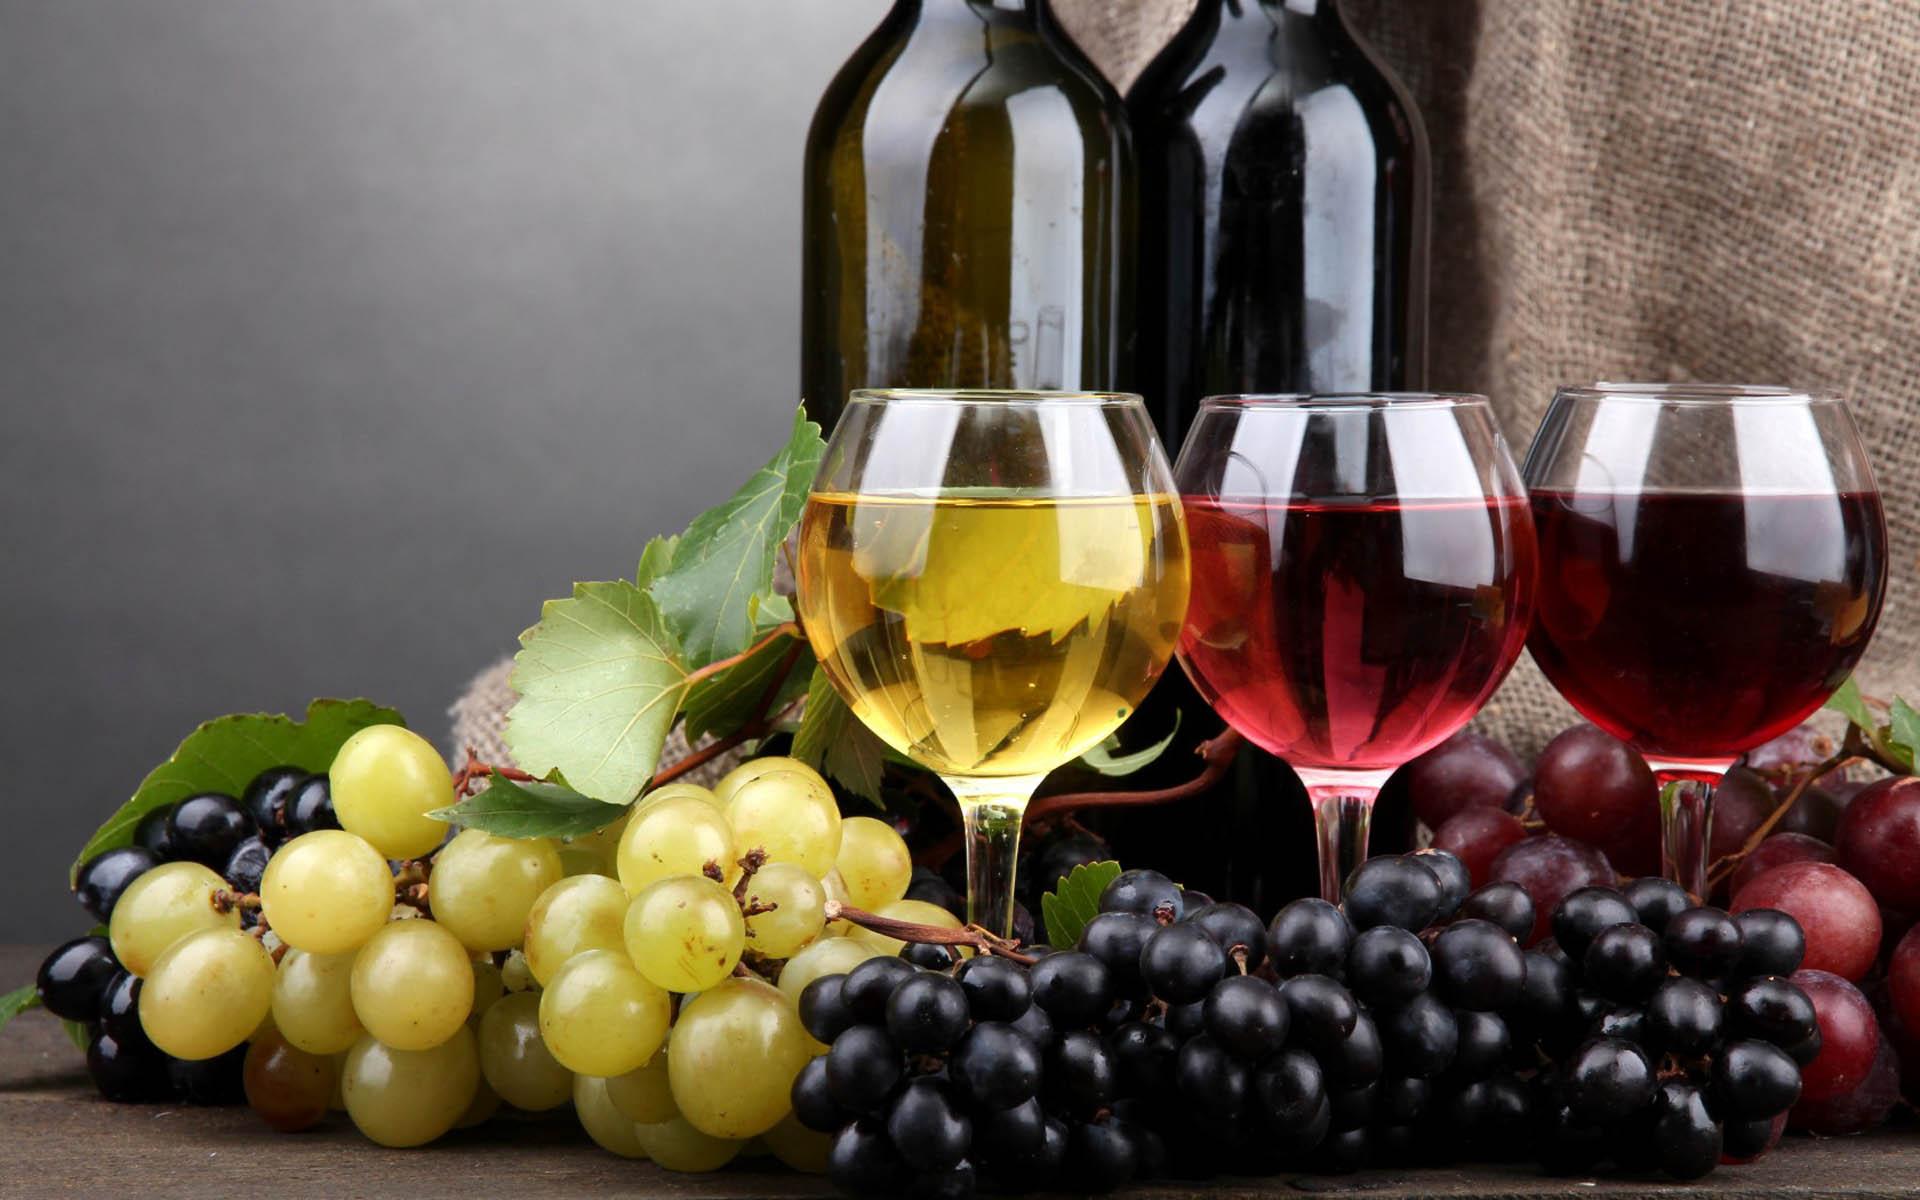 wine-wallenrud